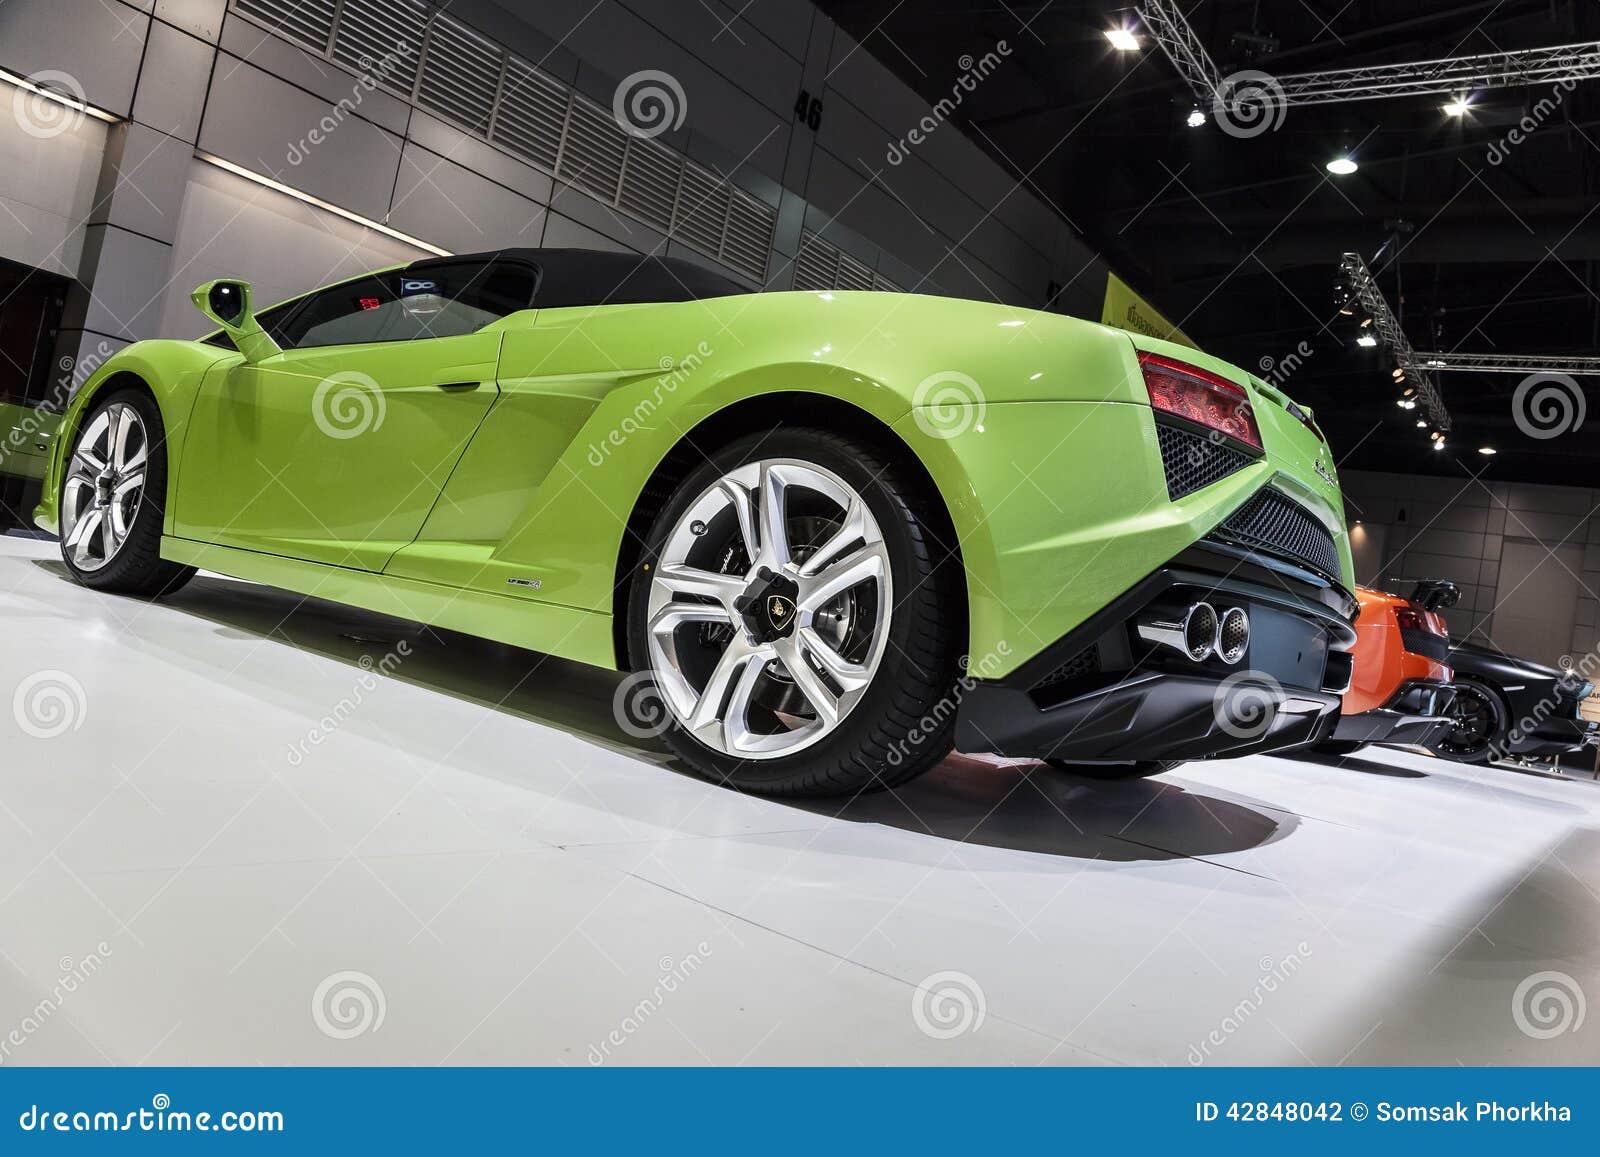 Green Lamborghini Gallardo Lp560 4 Spyder Editorial Photography